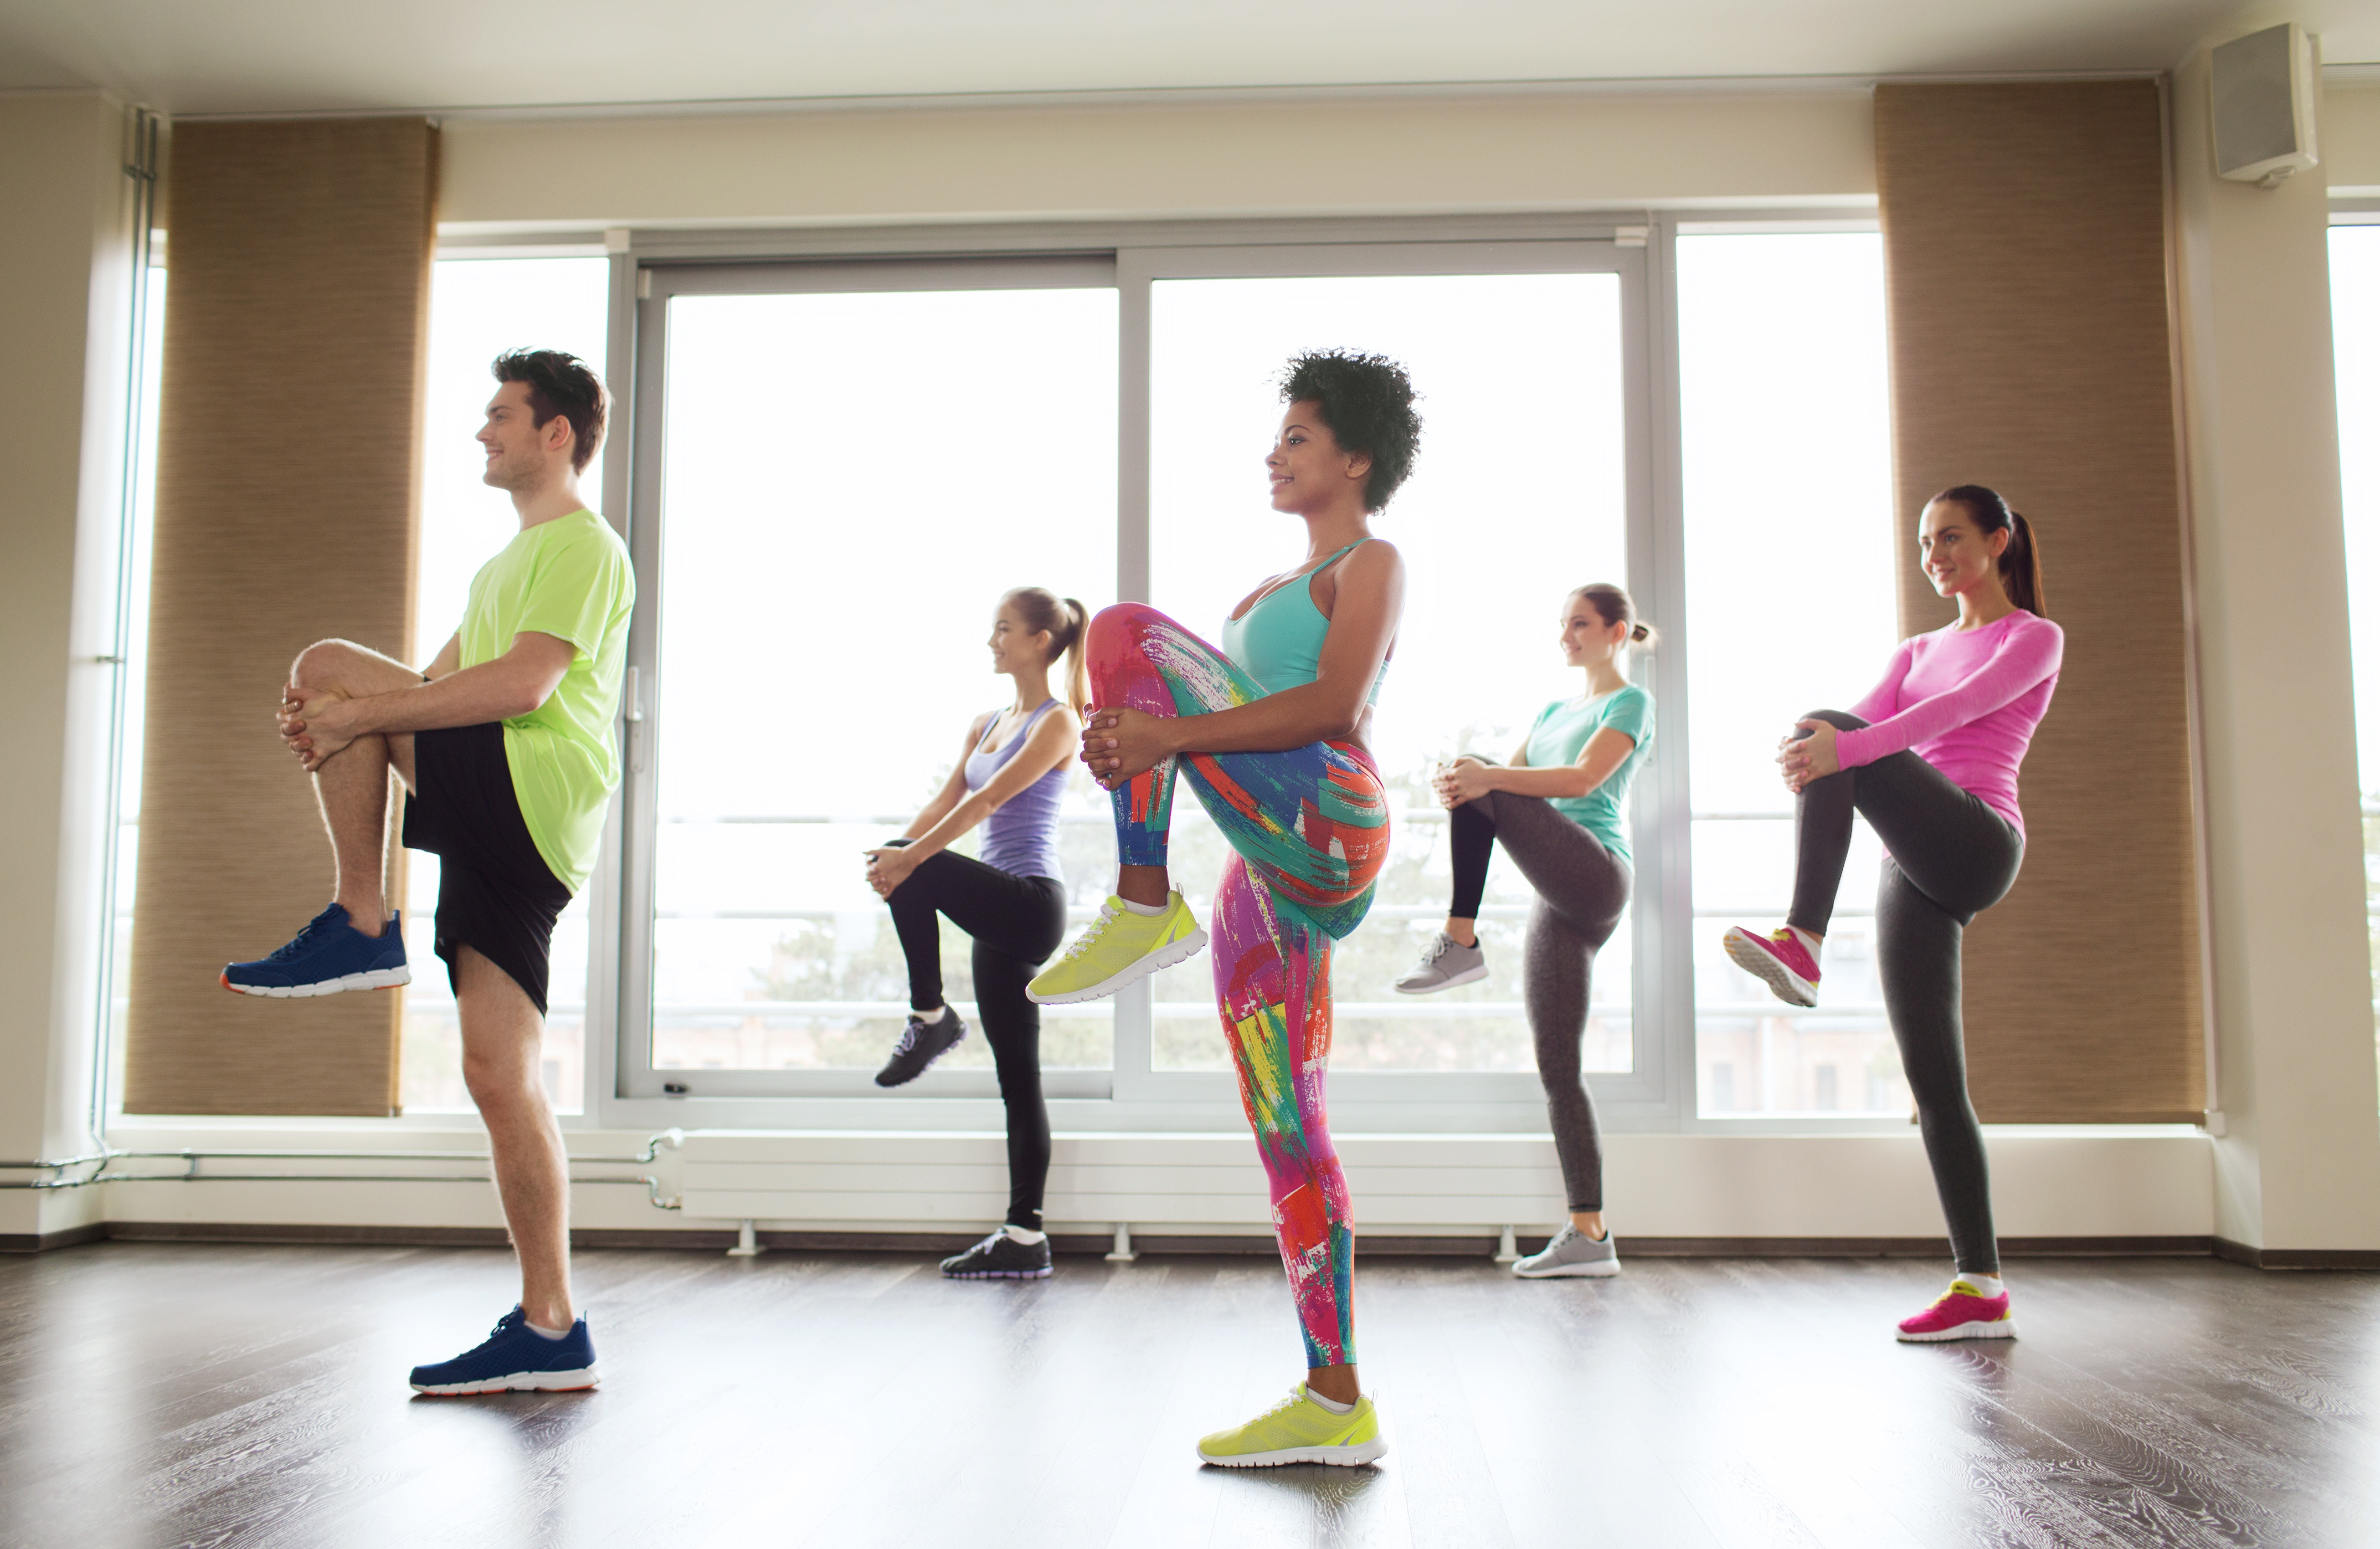 group fitness, employee fitness, wellness programs